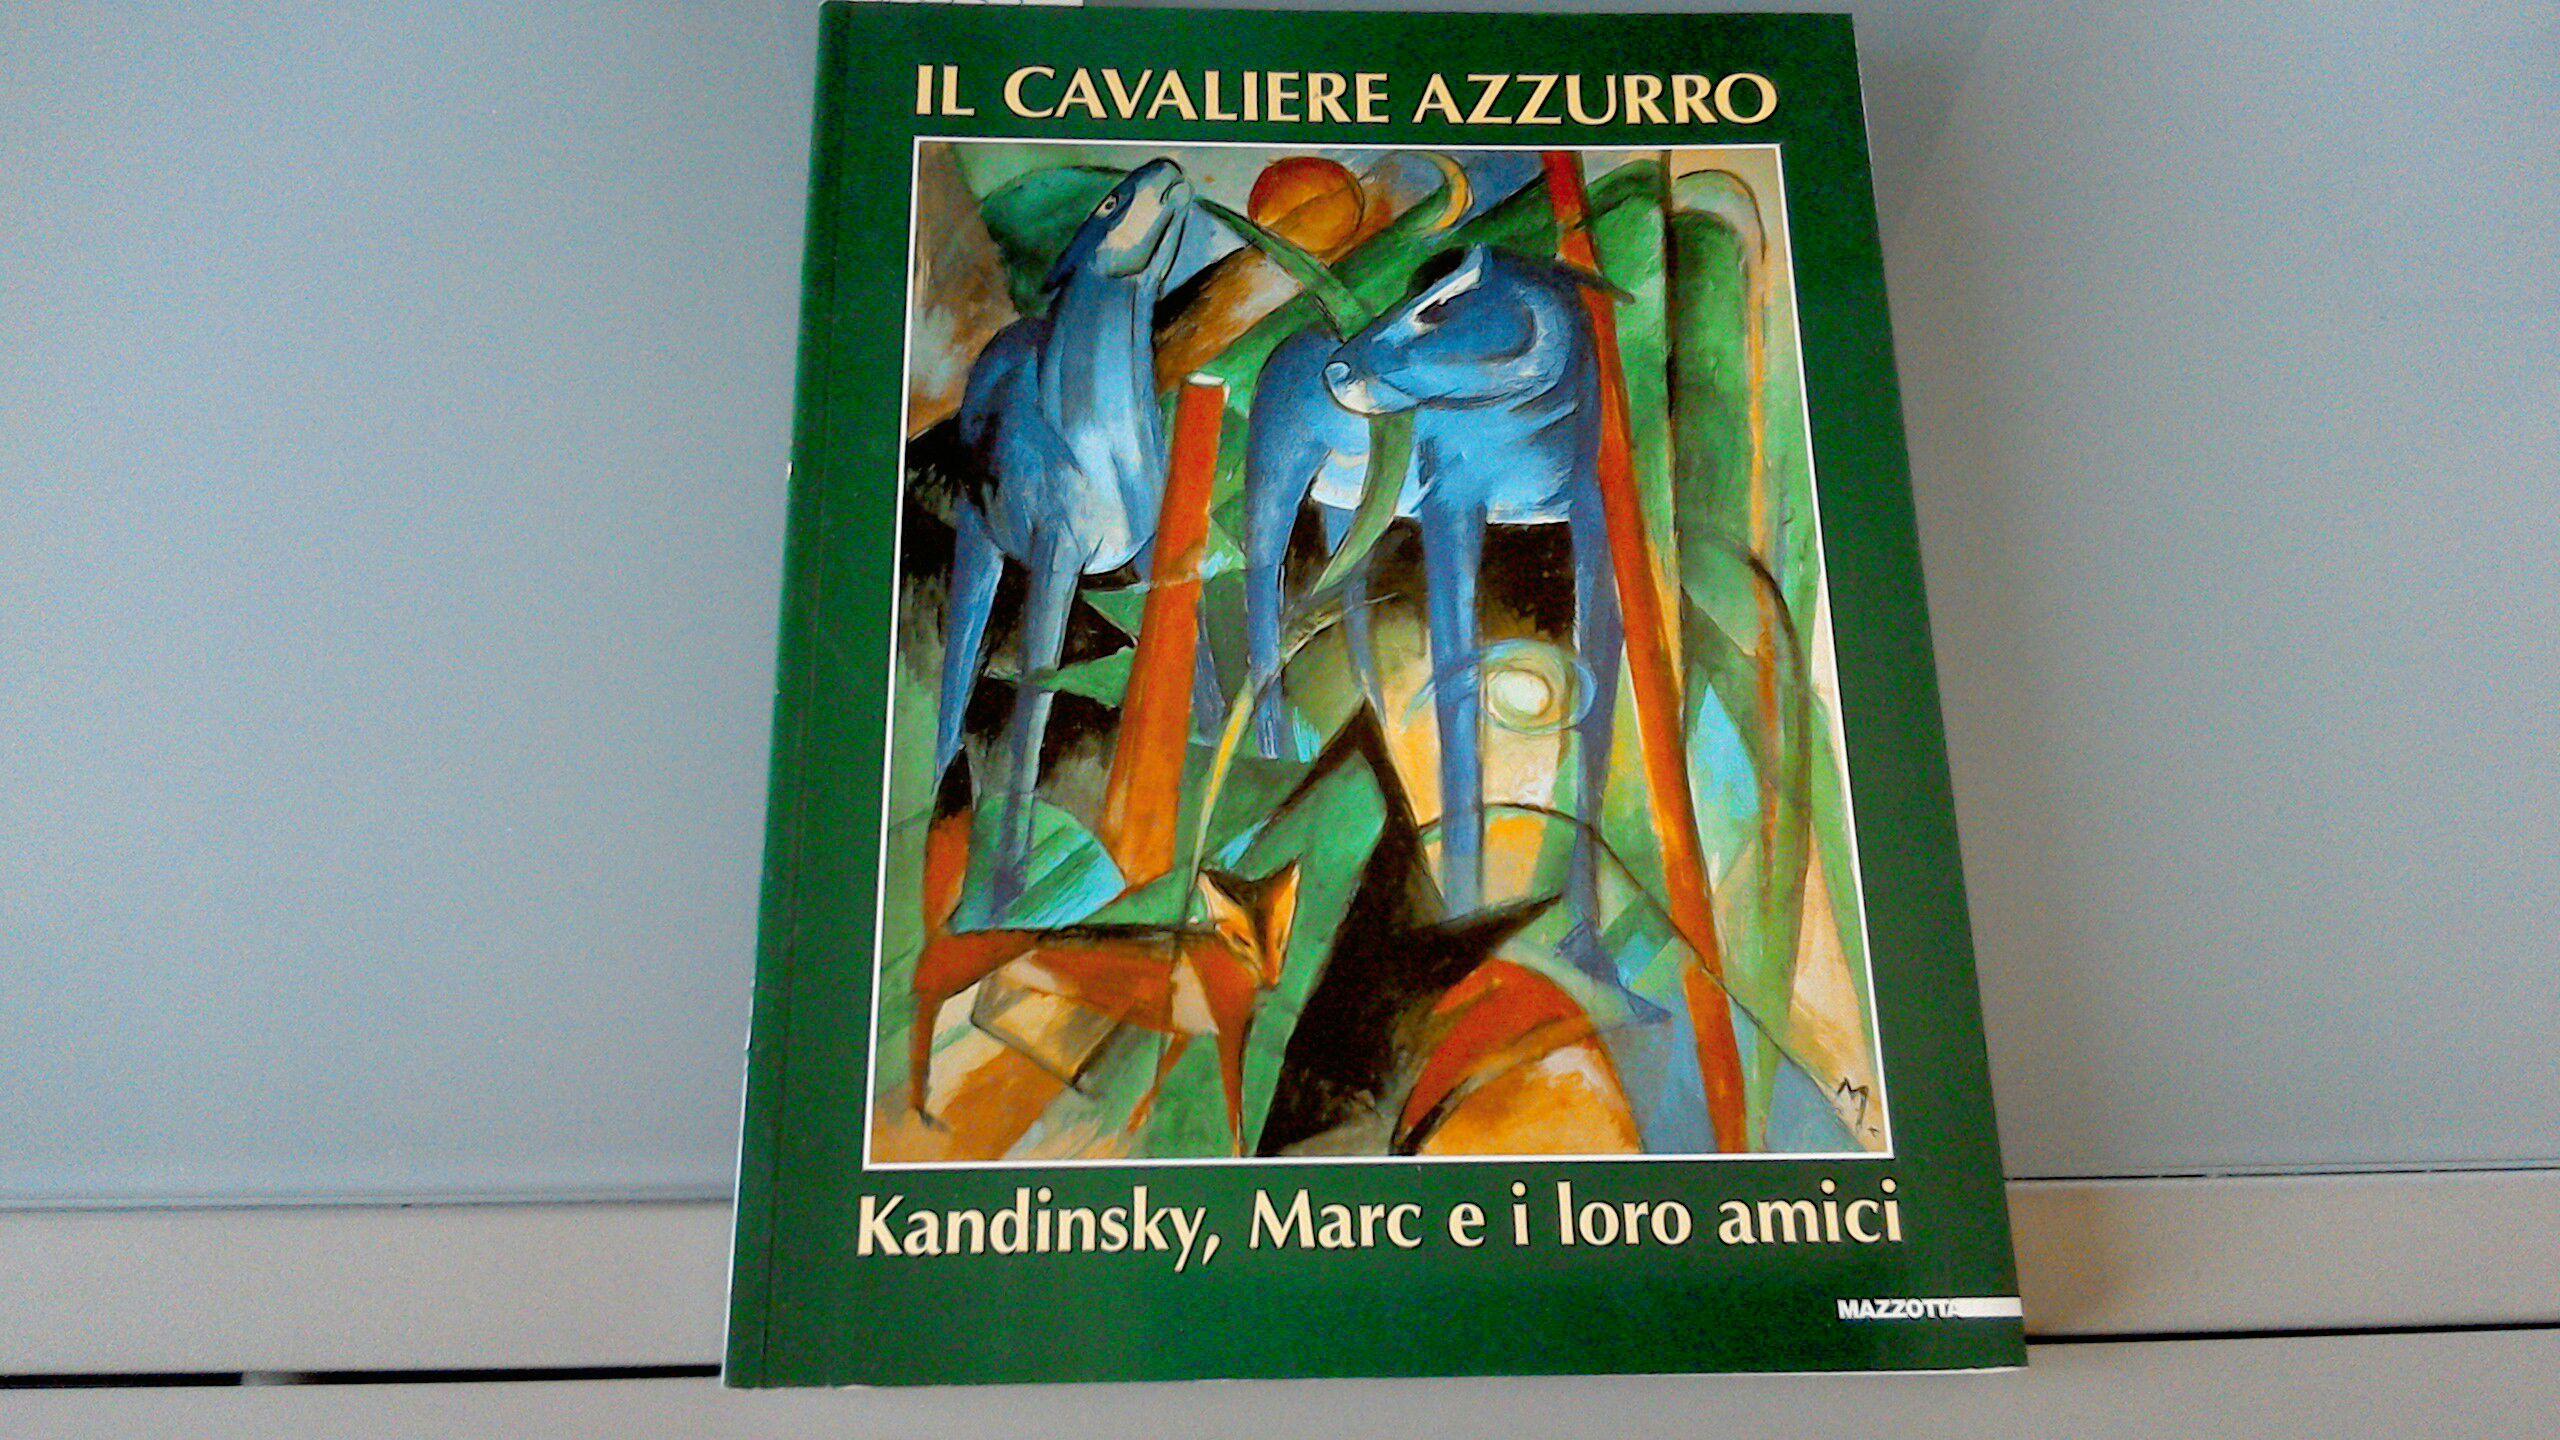 Quadri famosi Paul Gauguin vol XXV Stampa su tela arredo moderno arte design